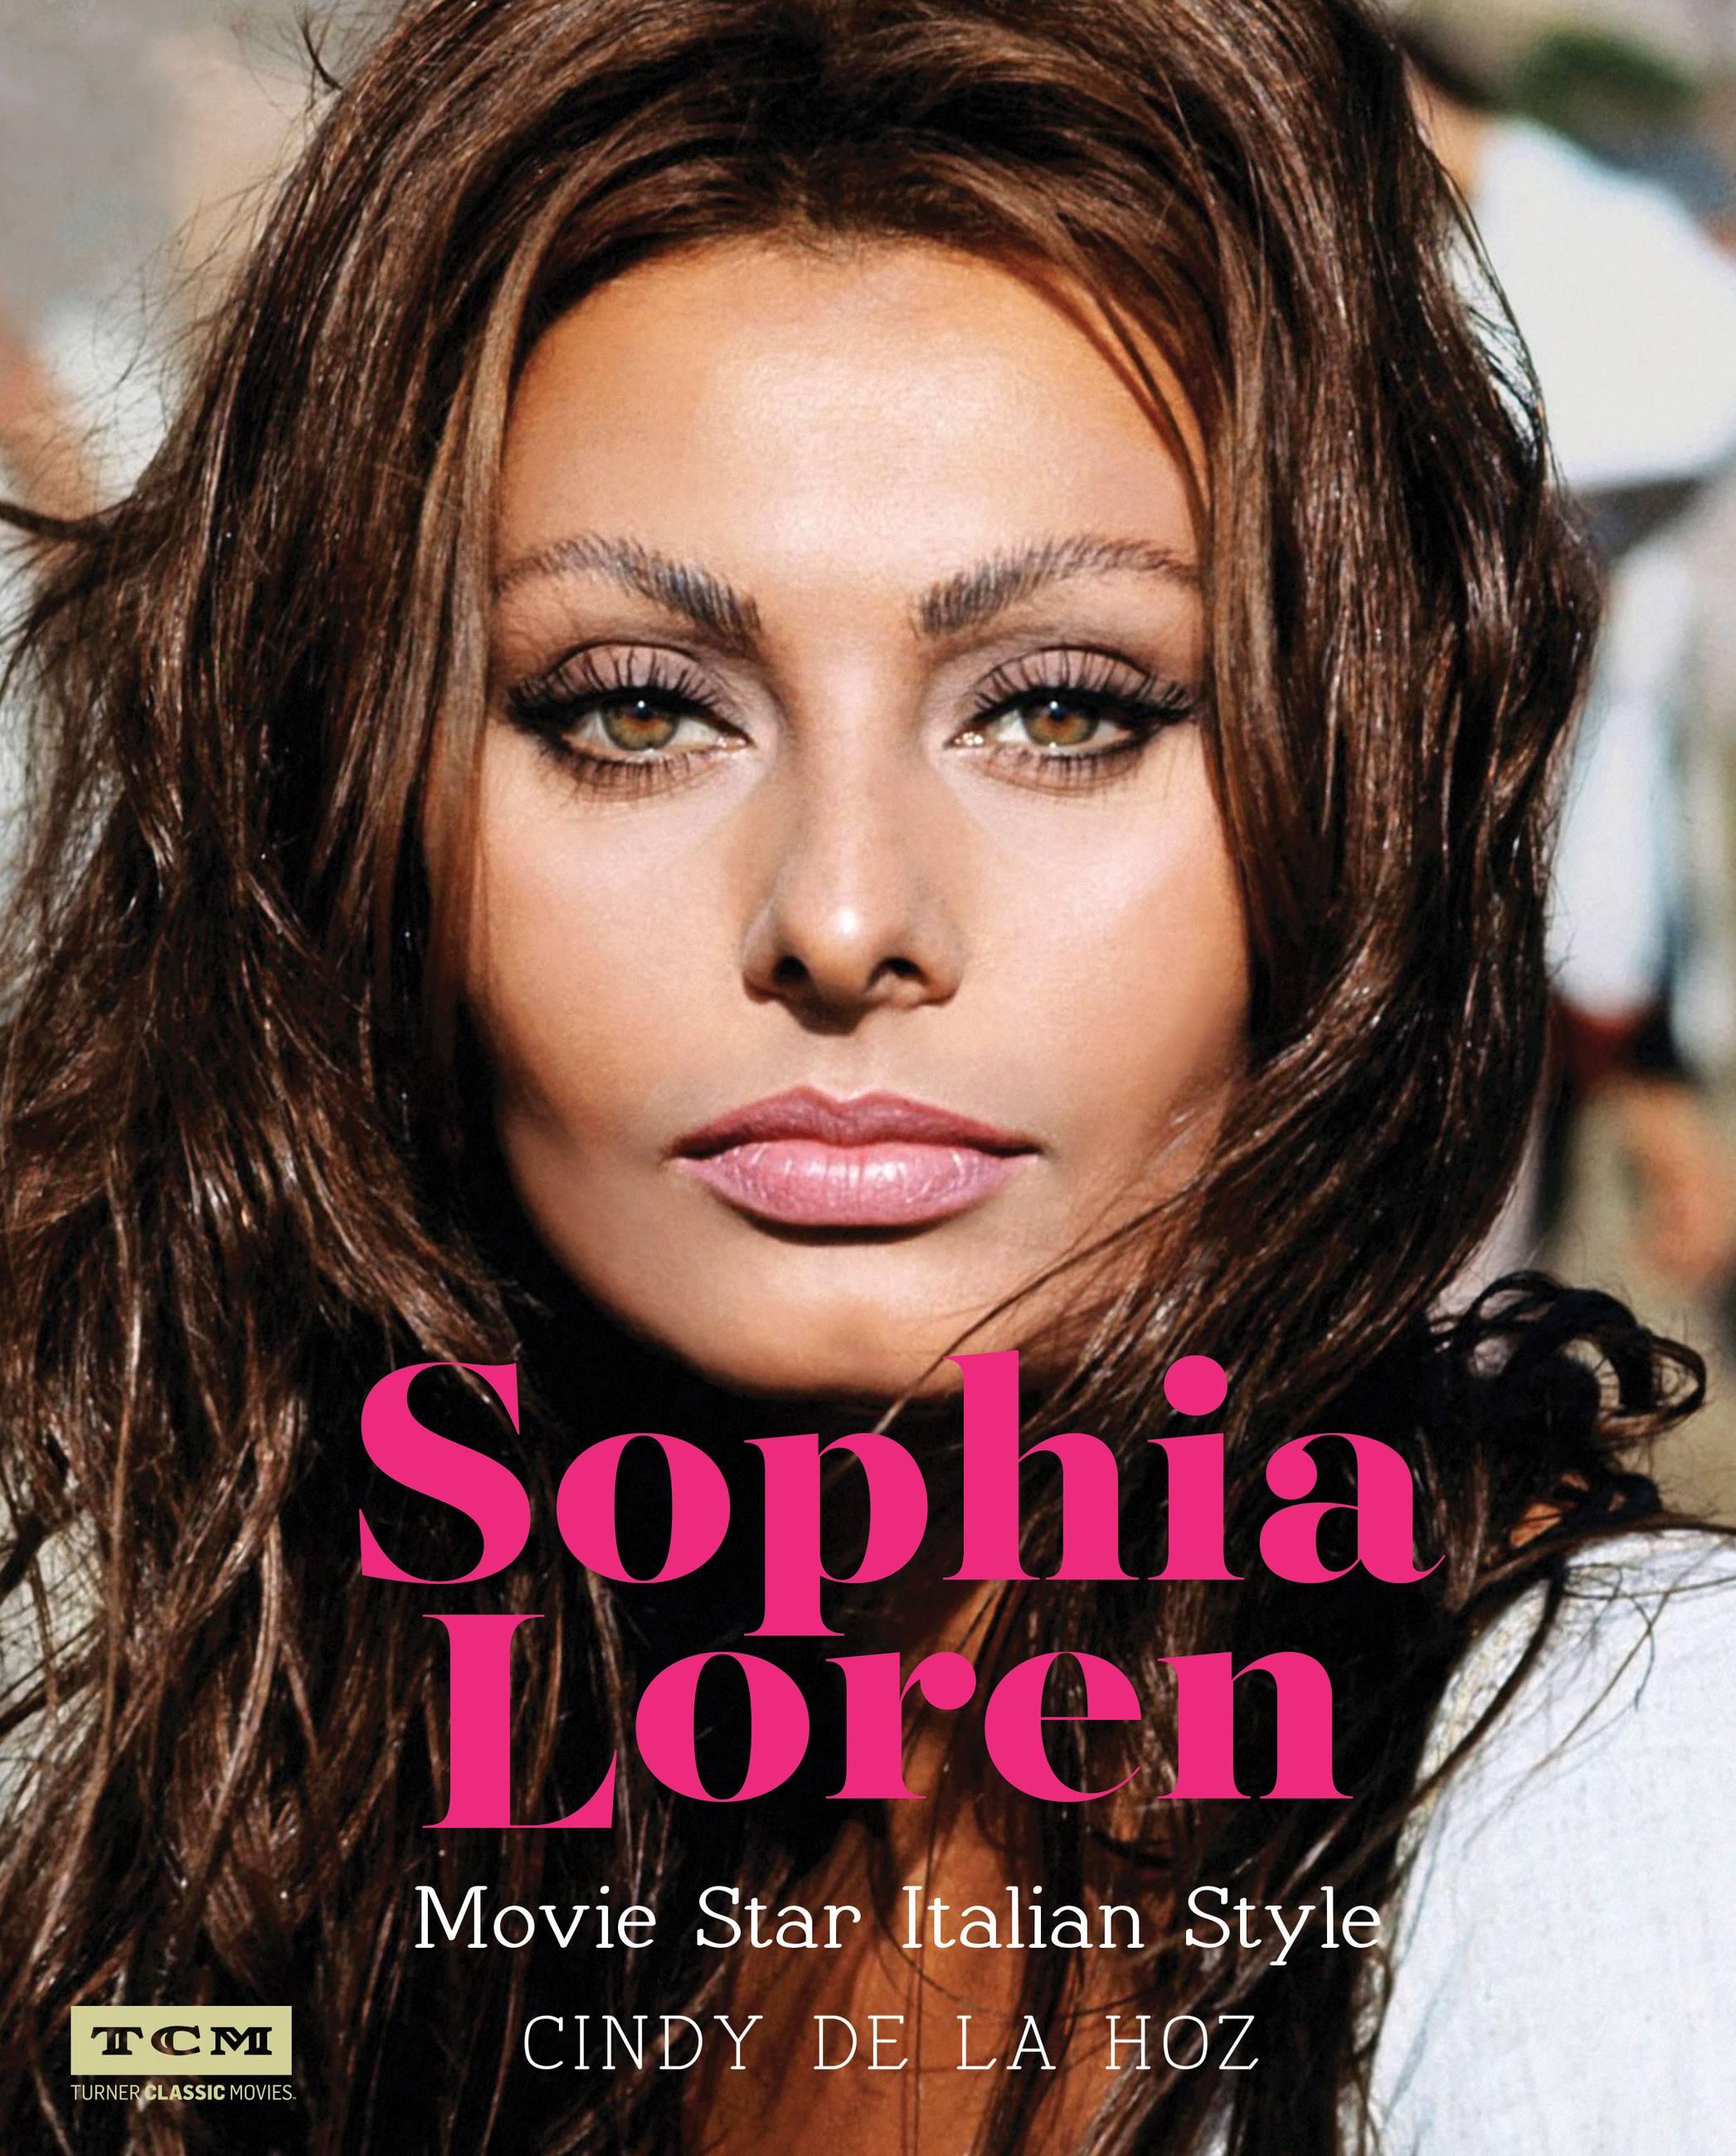 Sophia Loren By Cindy De La Hoz Running Press